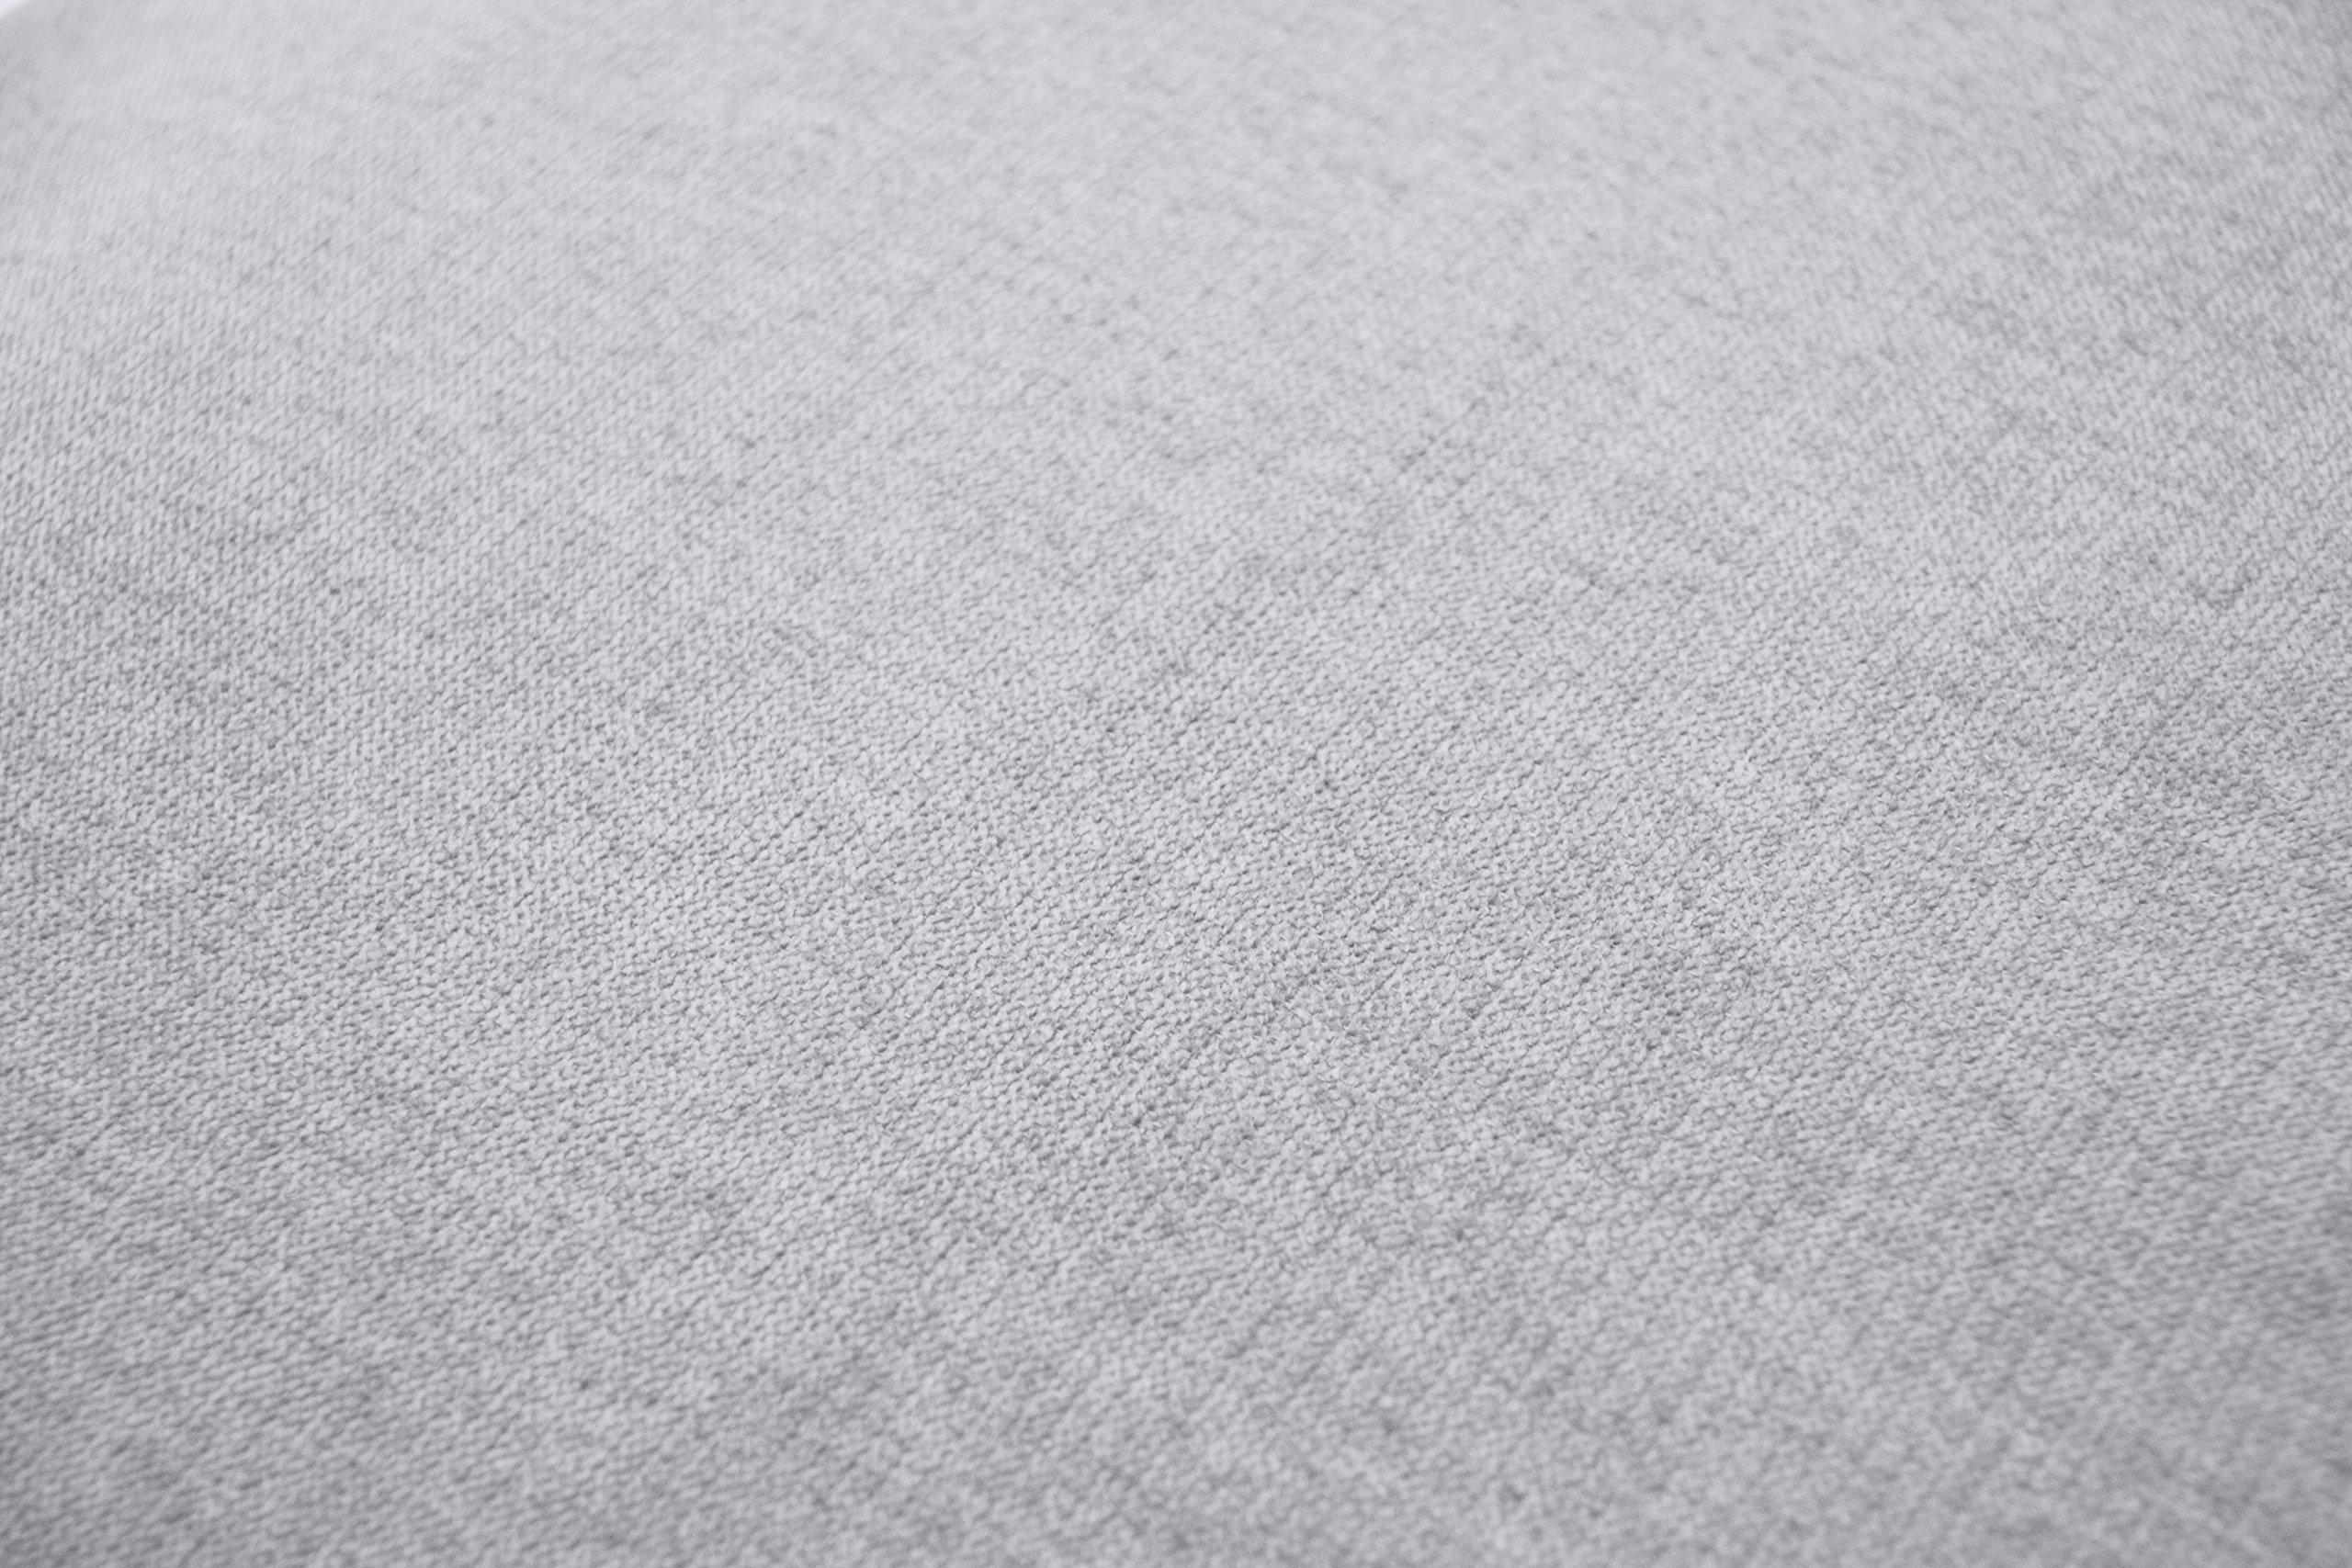 Serta Artesia Collection 61'' Loveseat in Smoke Gray by Serta (Image #6)